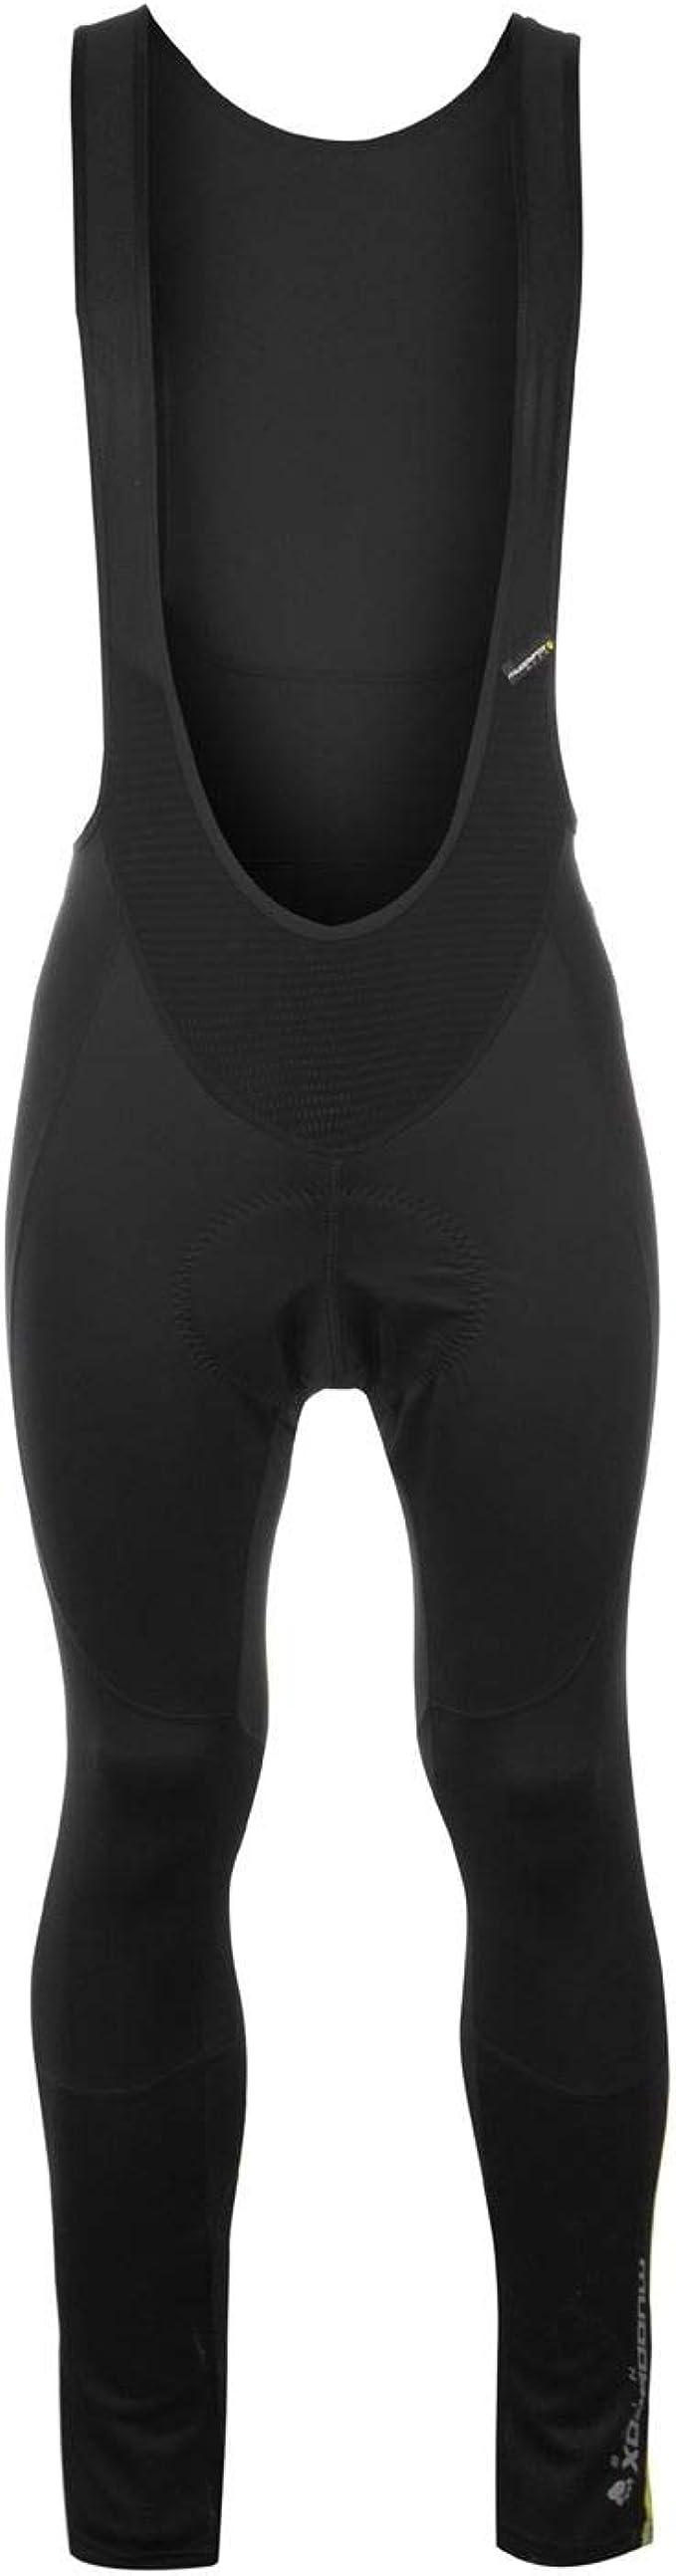 Muddyfox Nite Cycle Bib Tights Mens Gents Cycling Pants Trousers Bottoms Mesh